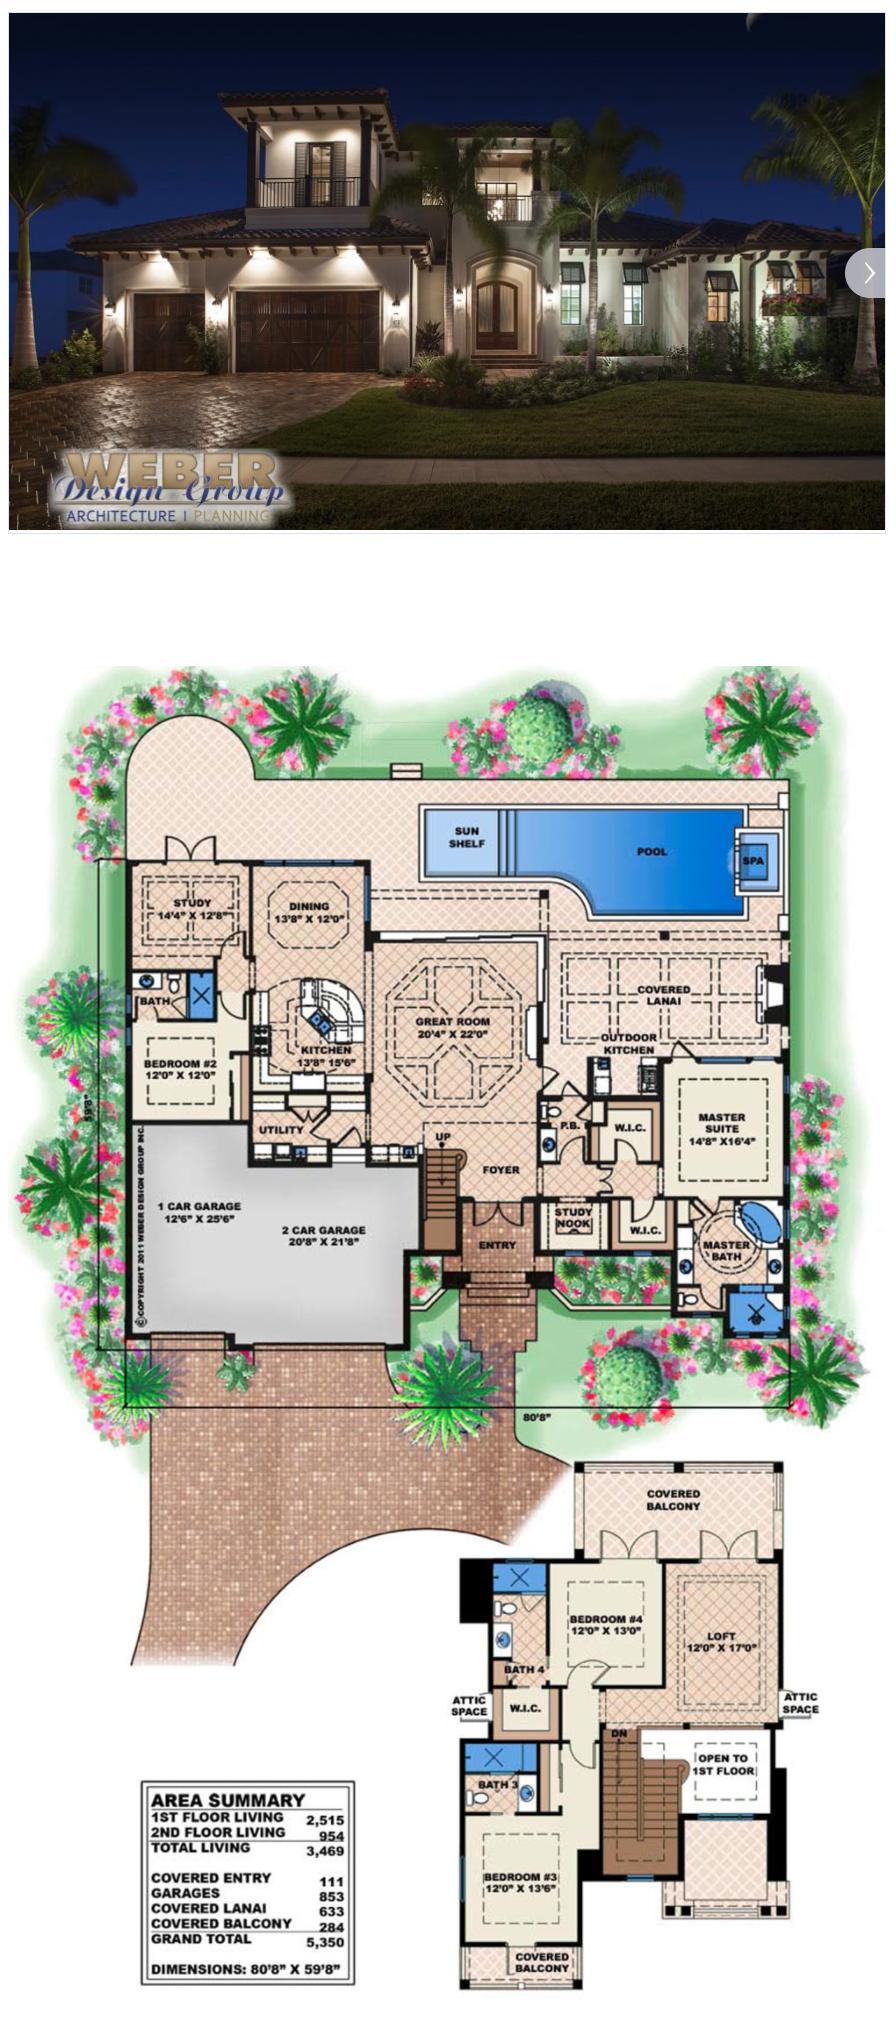 Beach House Plan Coastal Home Floor Plan Designed For Waterfront Lot Coastal House Plans Beach House Plans Beach House Plan